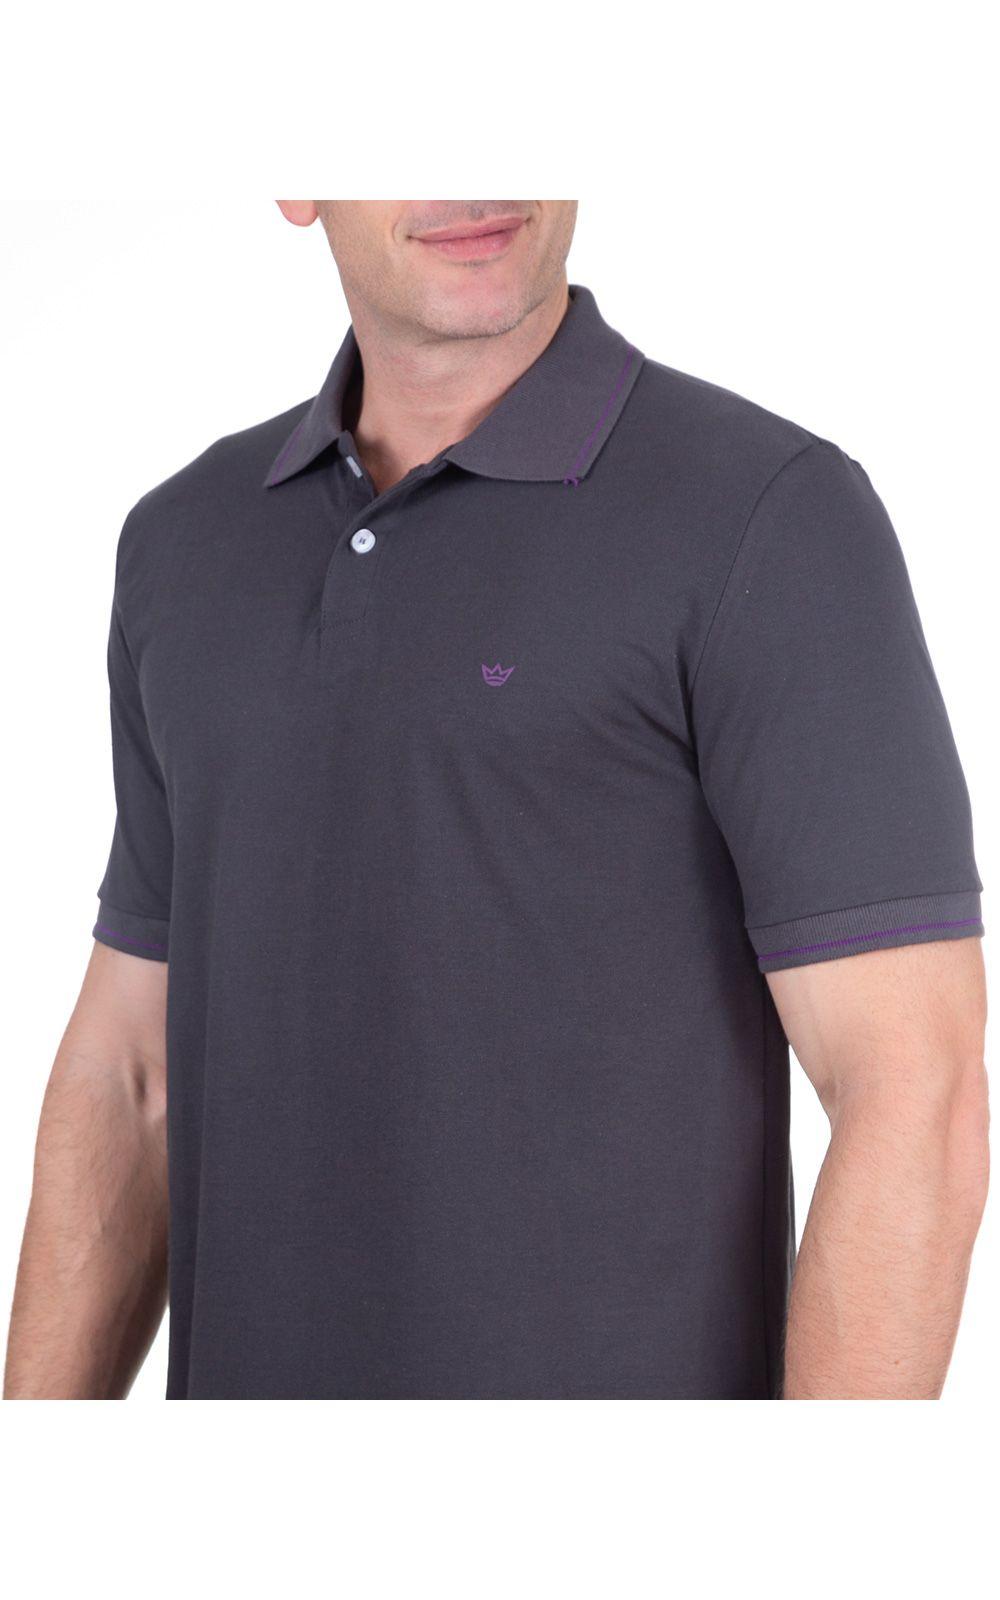 Foto 3 - Camisa Polo Masculina Cinza Escuro Lisa